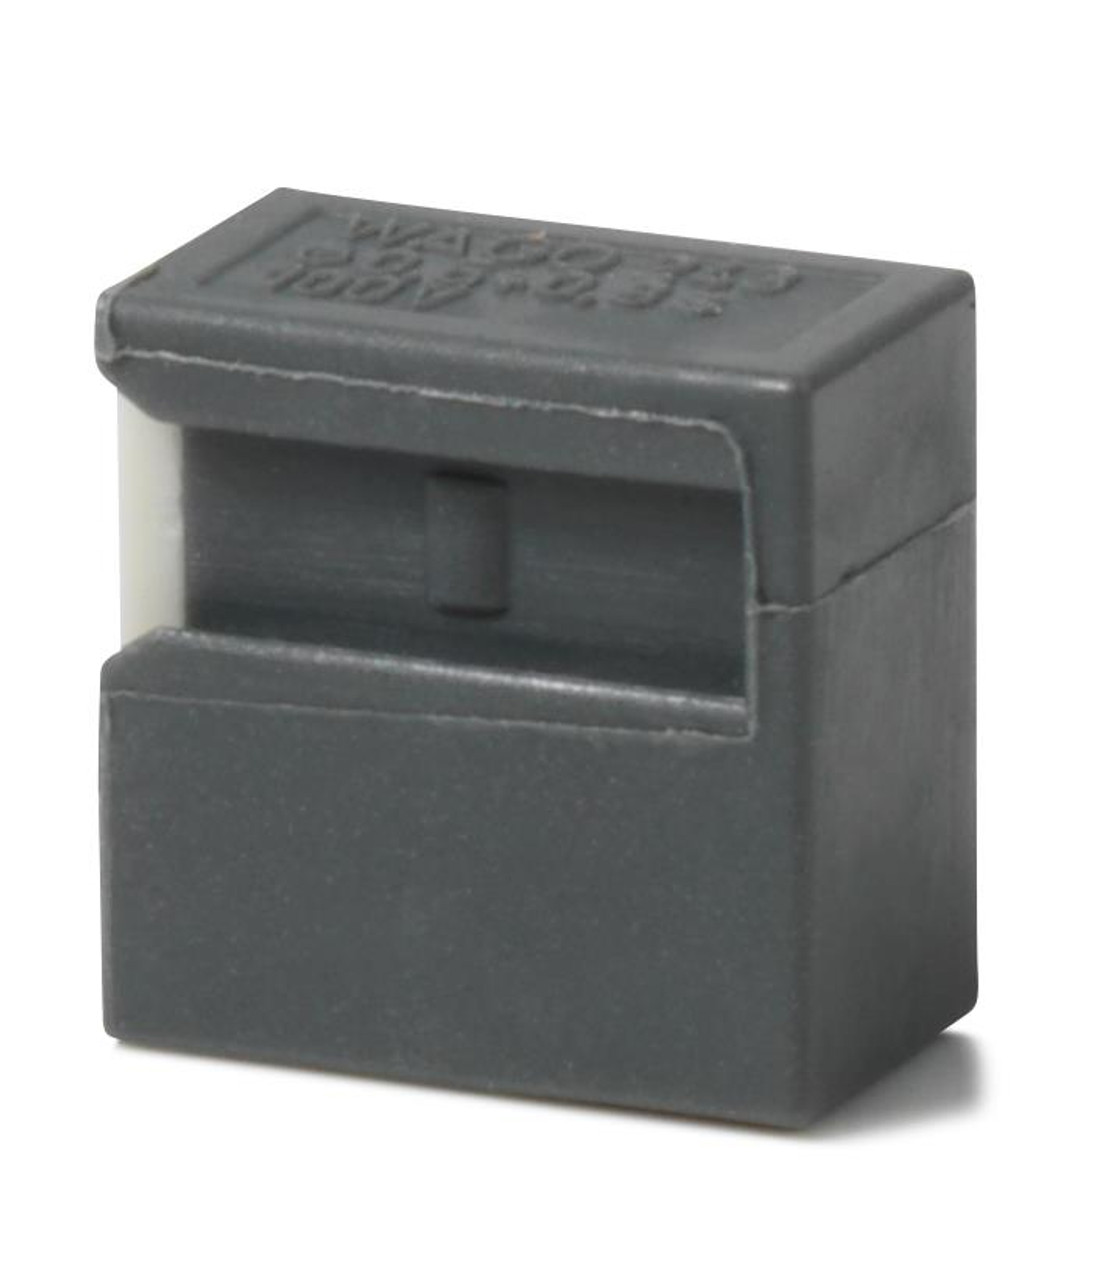 Siemens DBZ1190-AA, 4677080001, Micro terminal 0,5 mm, 4-pole